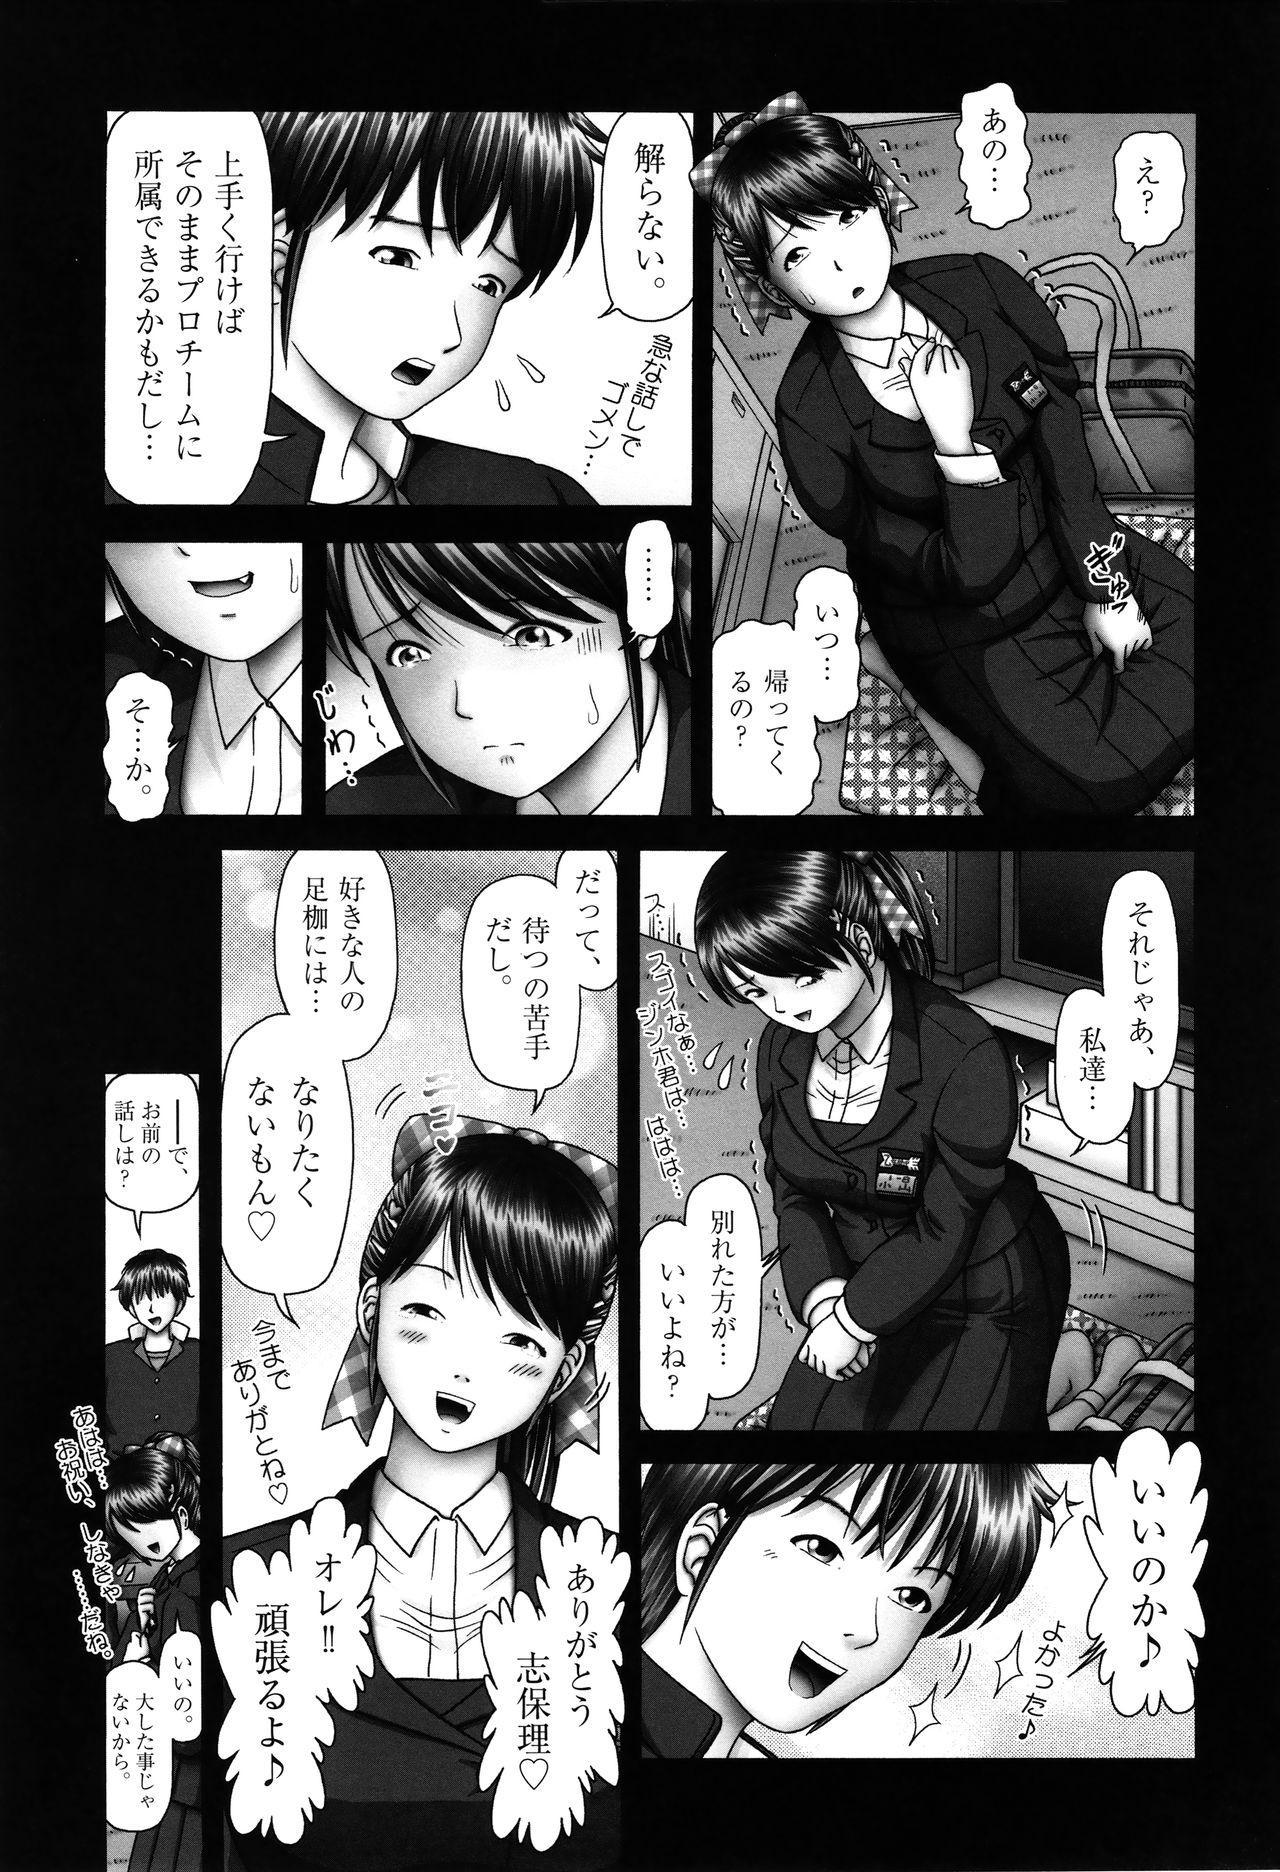 Shoujo Kumikyoku 17 15